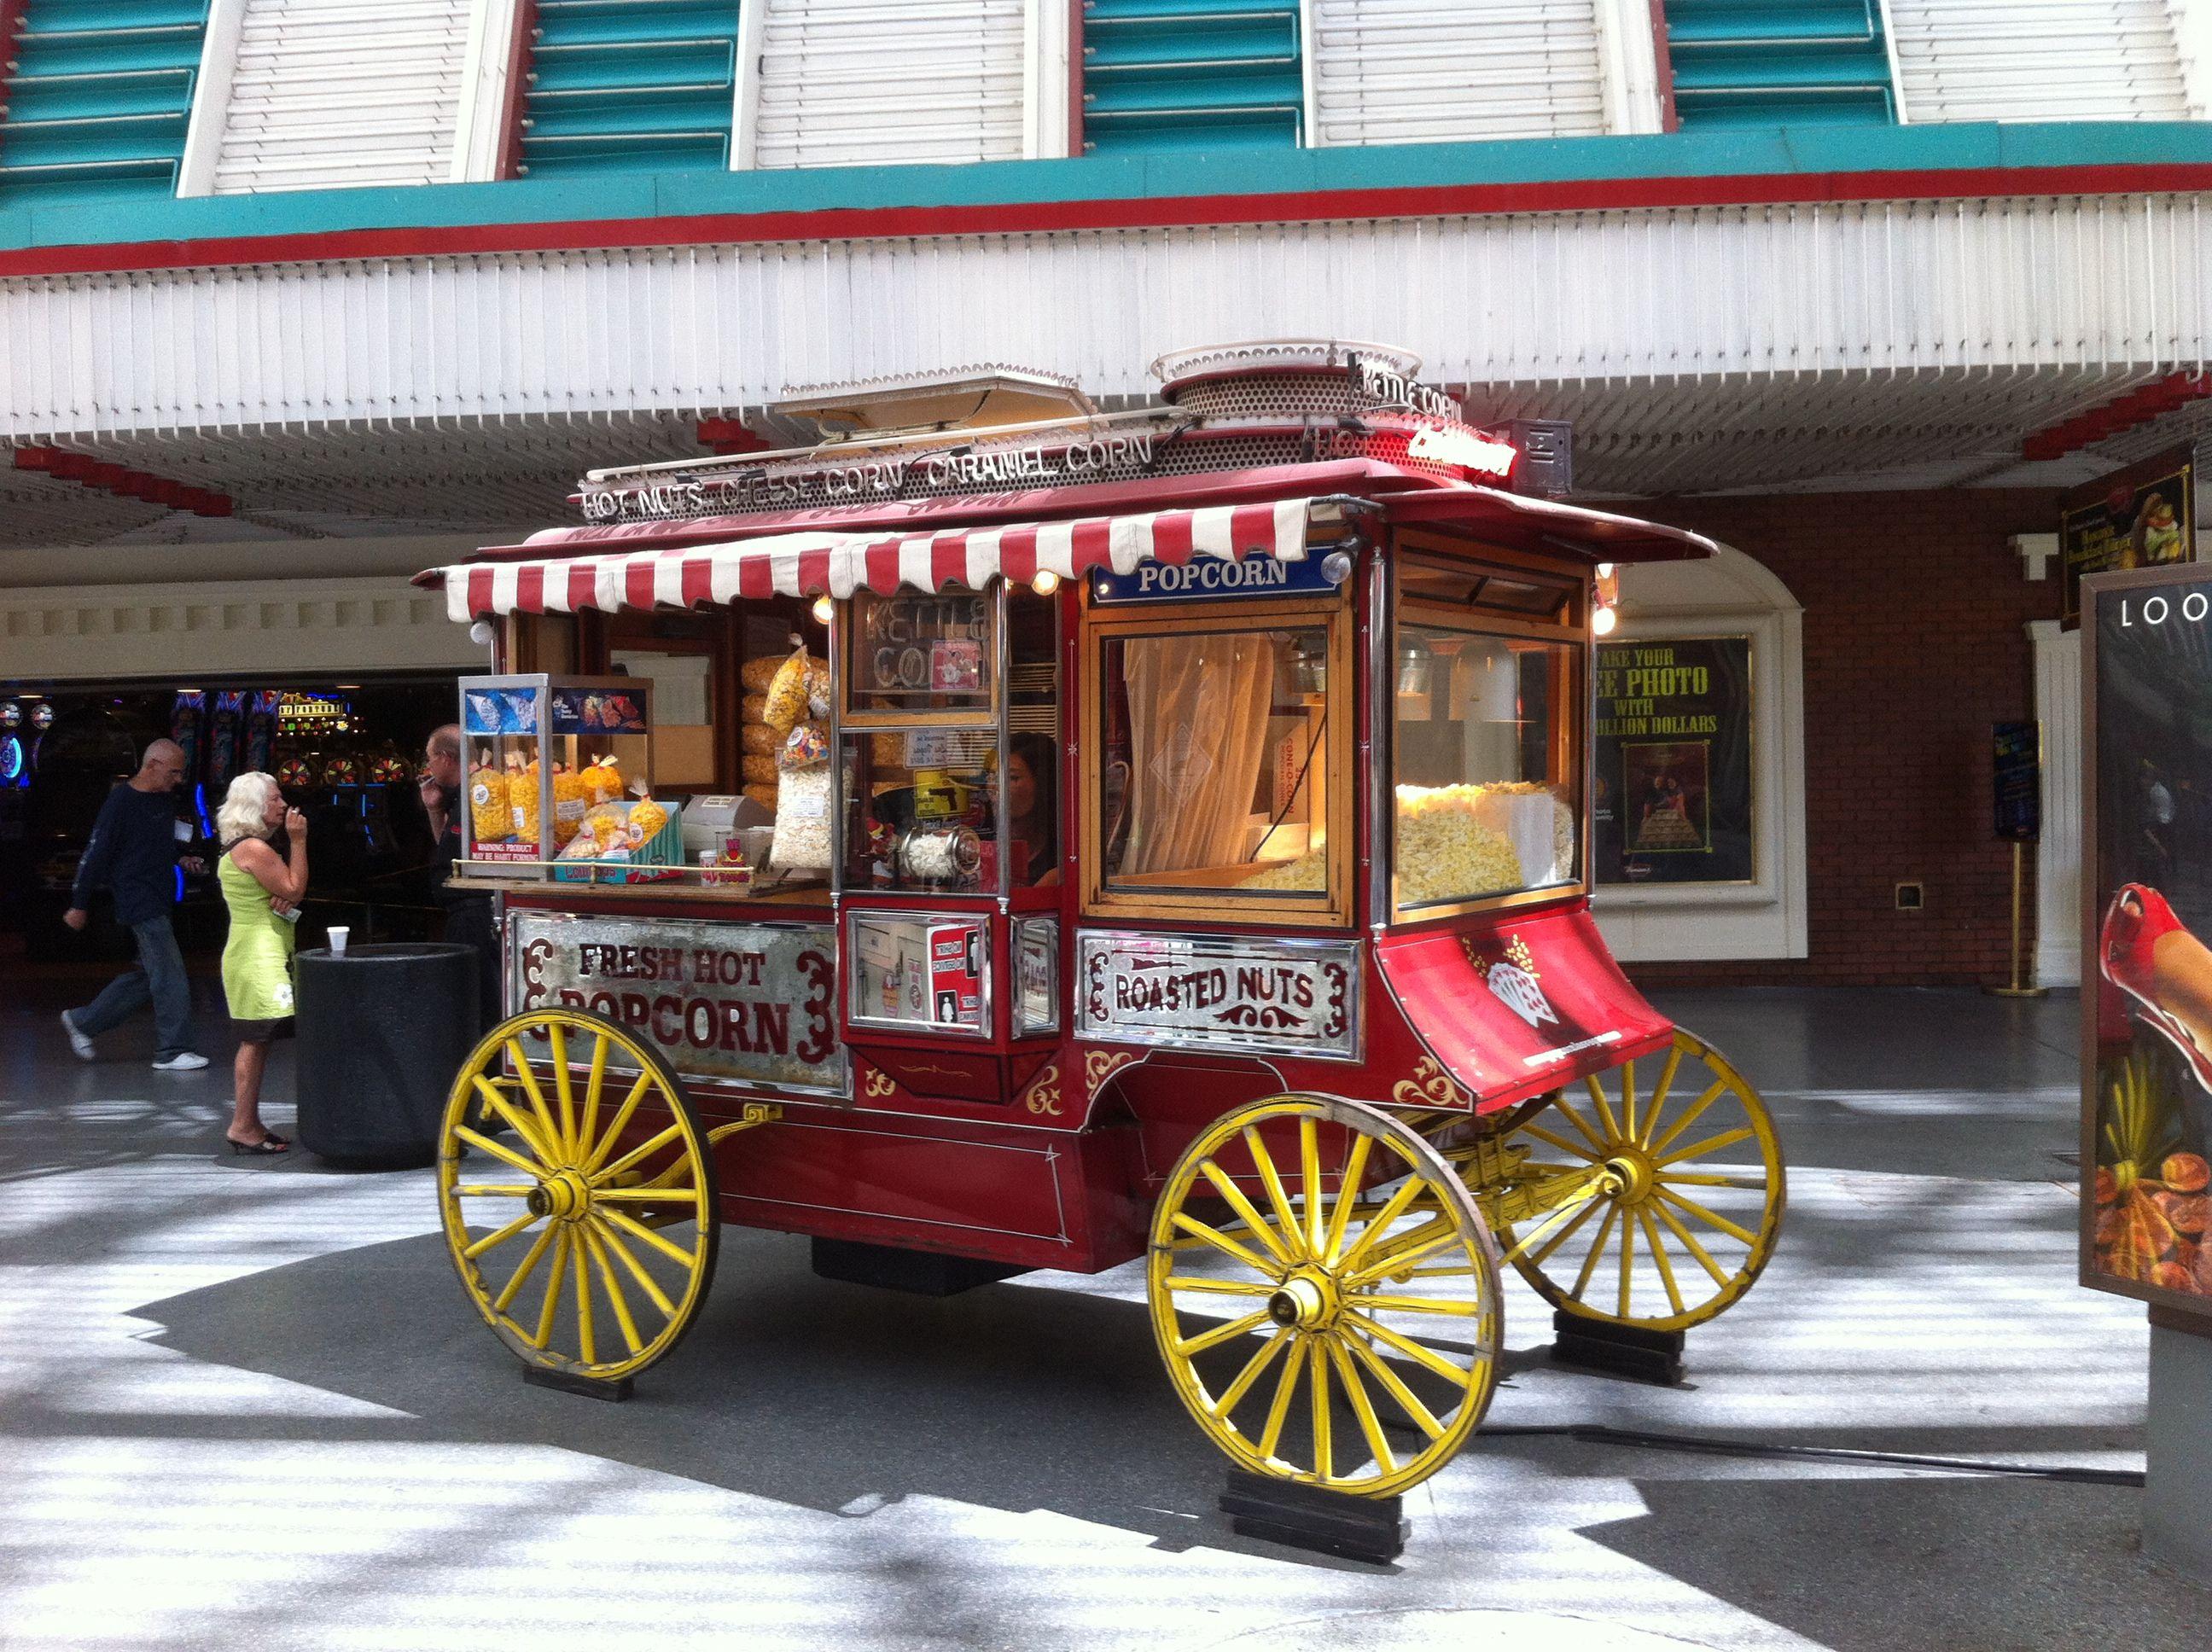 My Favorite Spot   Las Vegas Popcorn Vendor   Fremont Street Photo By: